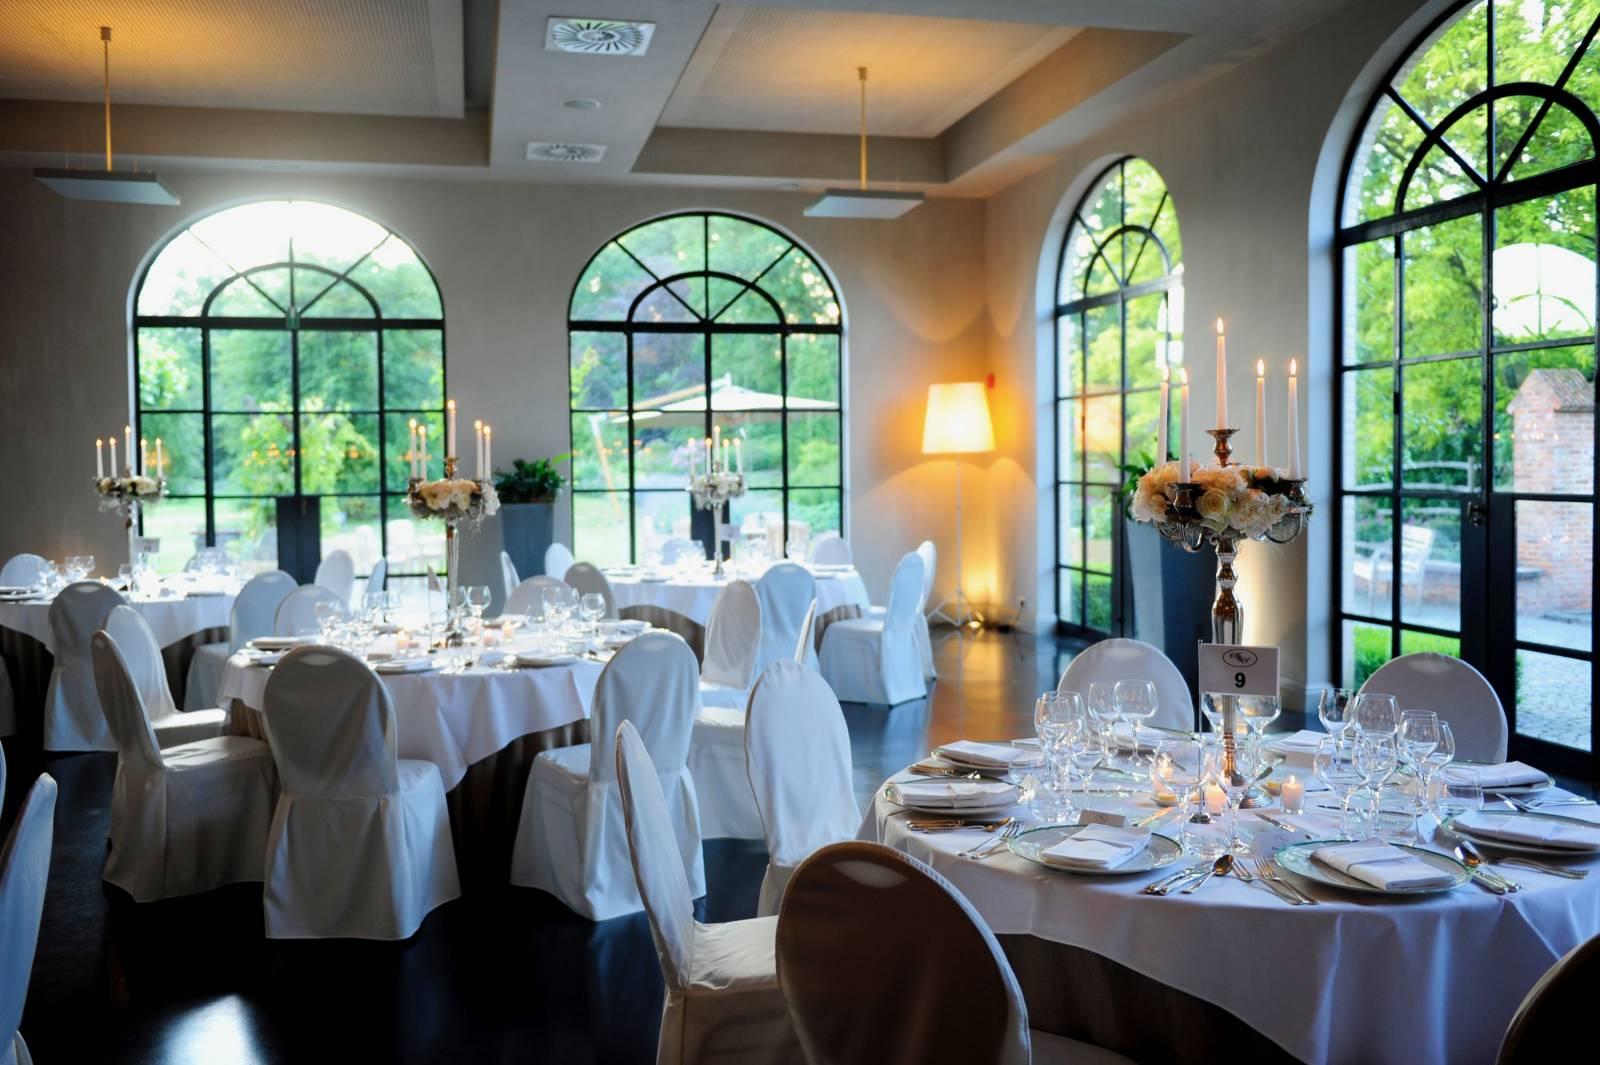 De Barrier - Feestzaal -  House of Weddings - 20